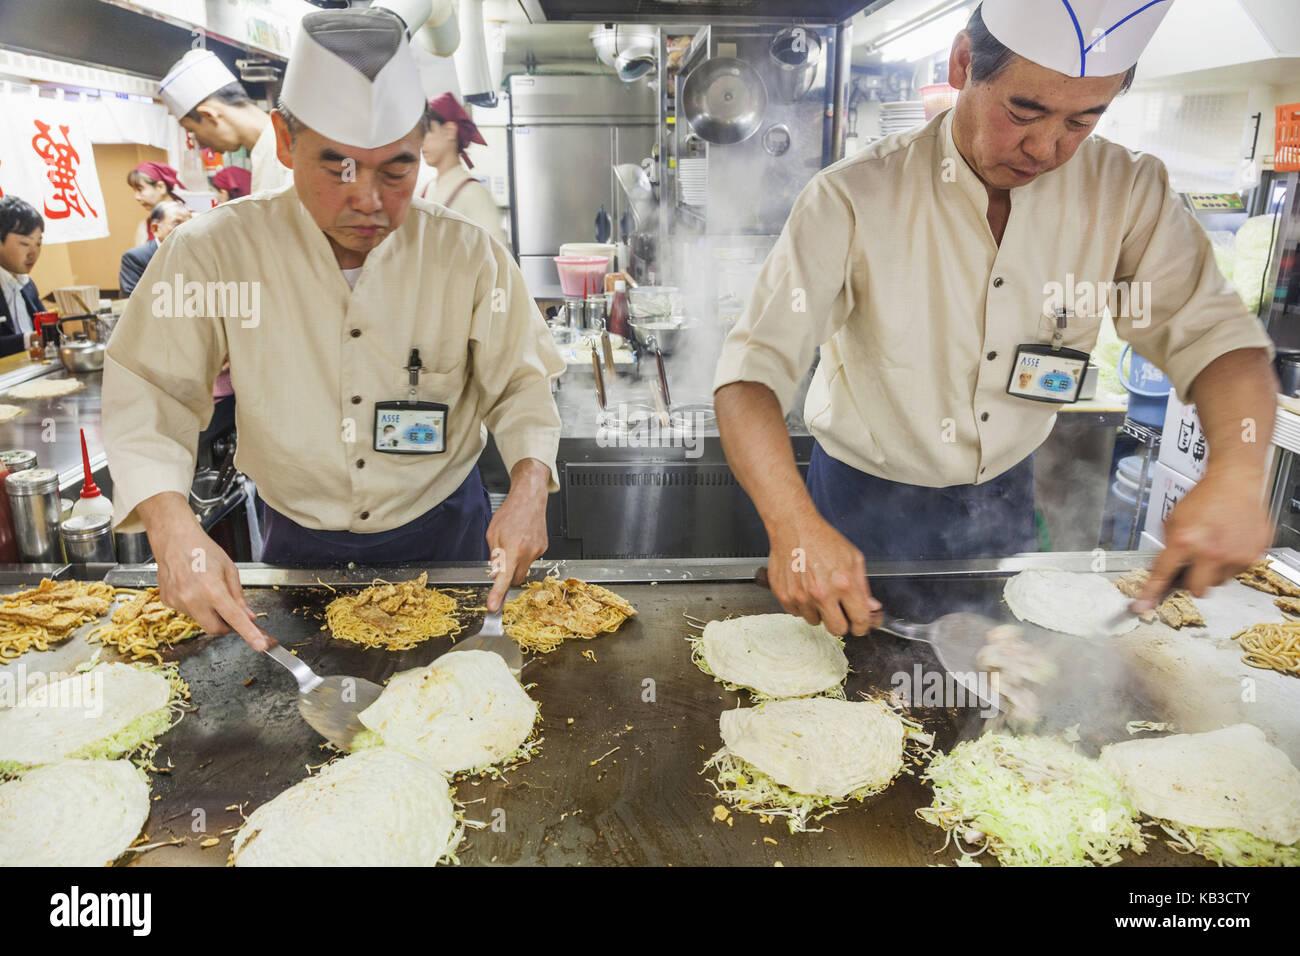 Japan, Kyushu, Hiroshima, restaurant, cooks while preparation of Okonomiyaki, Stock Photo